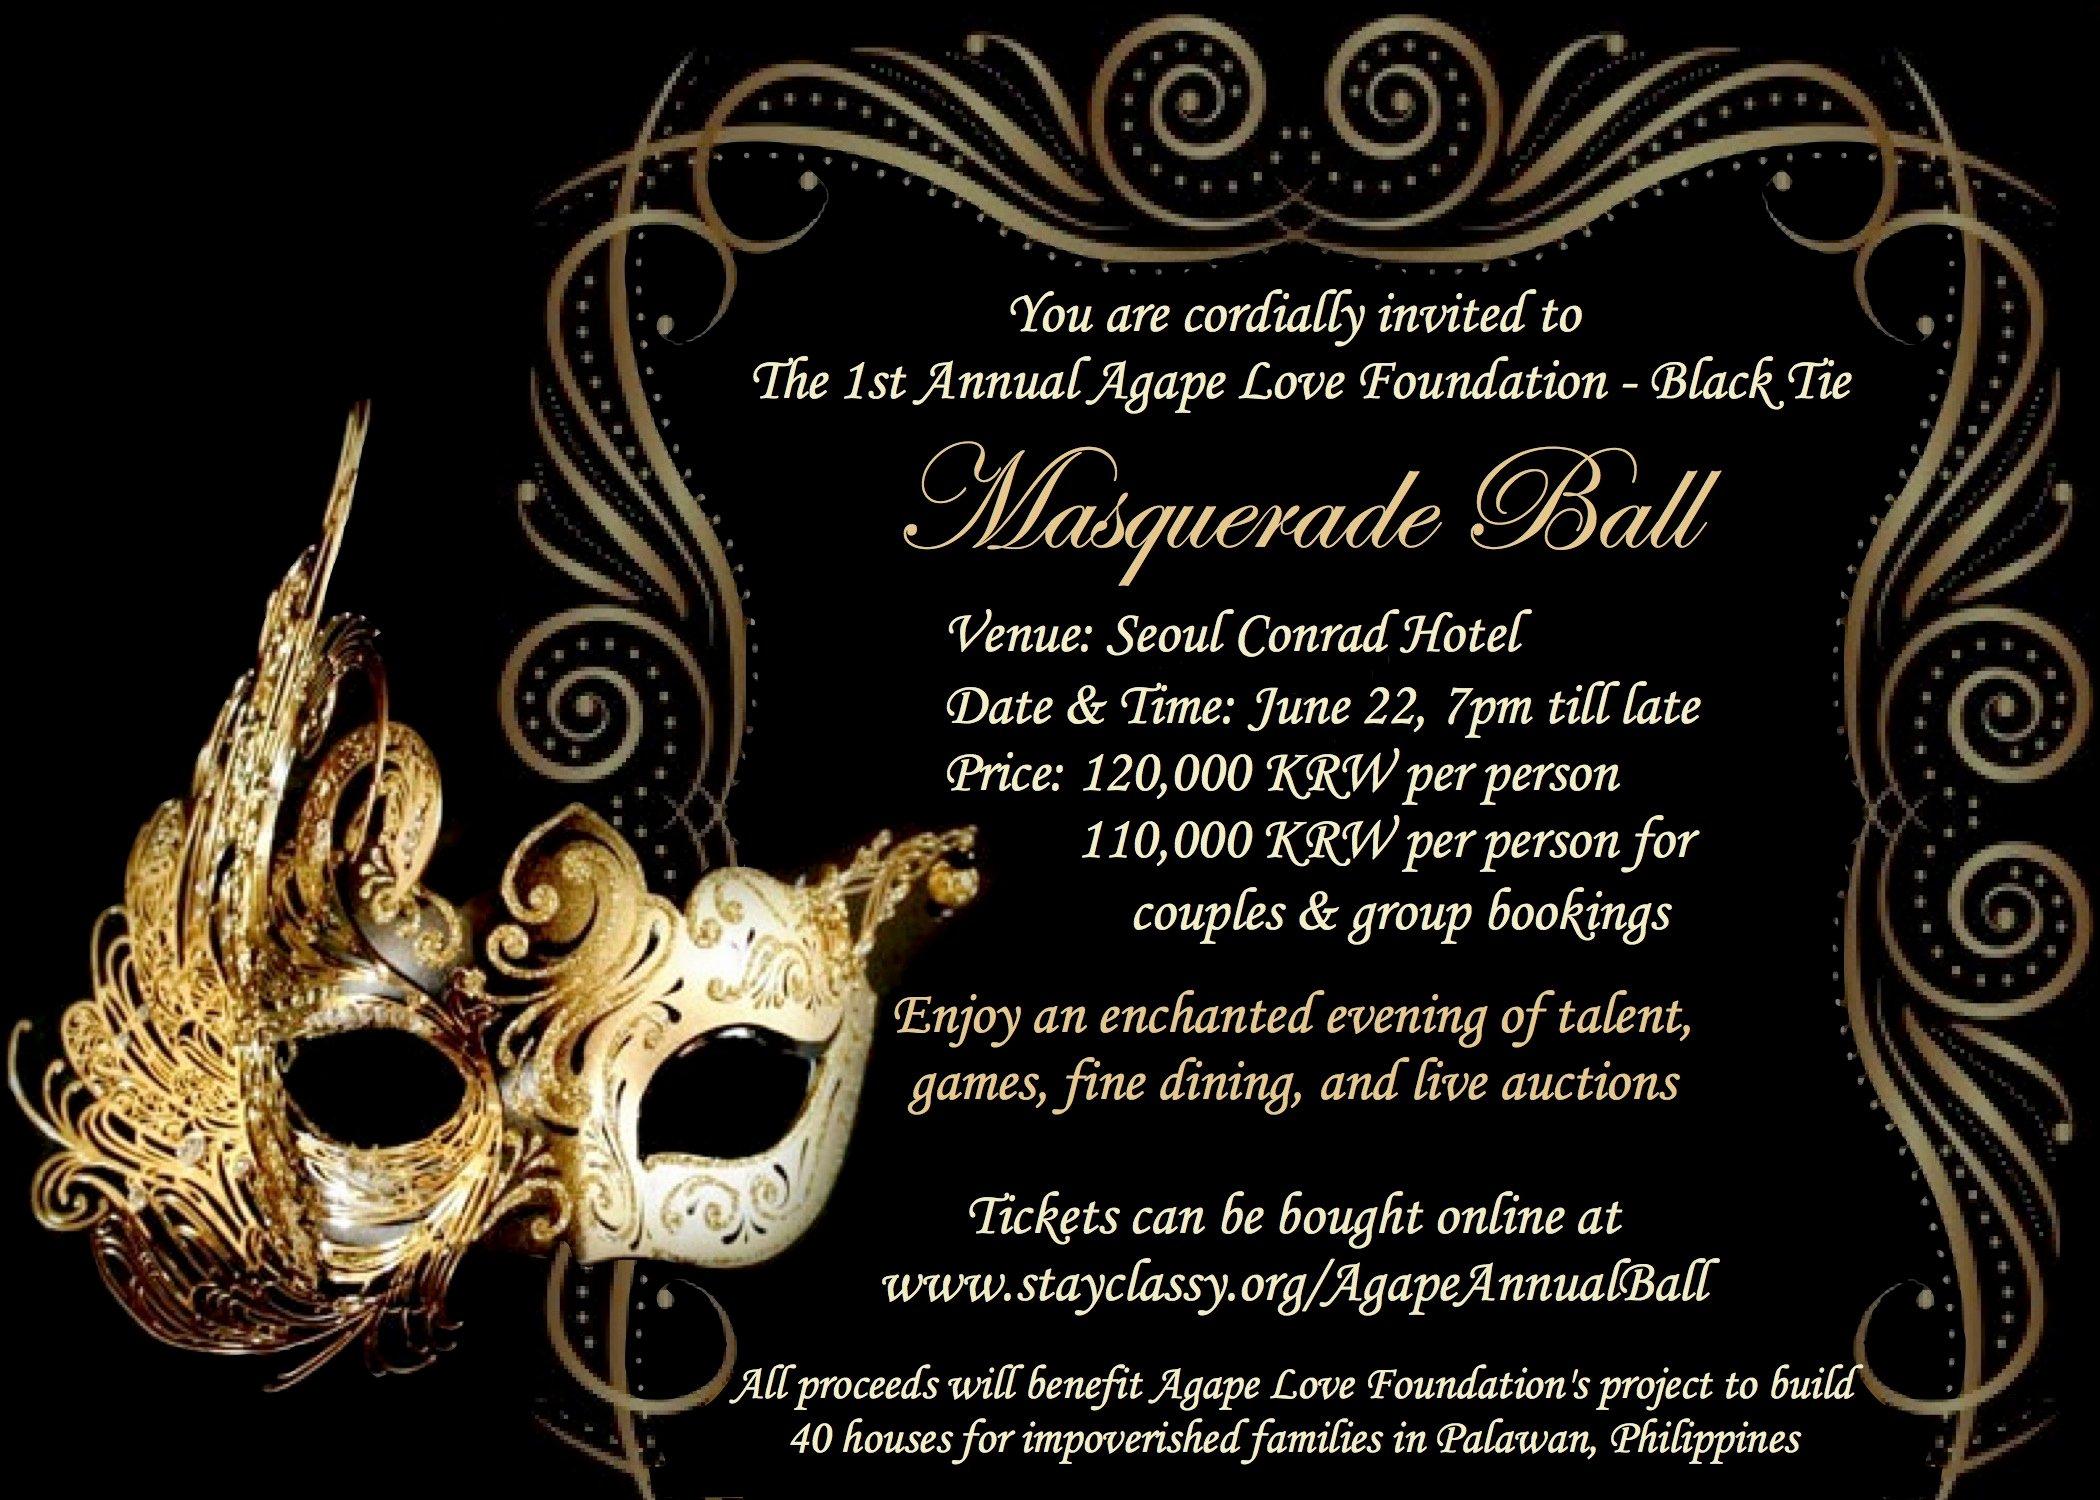 Masquerade Party Invitations Templates Free Awesome Birthday Party Invitations Free Templates